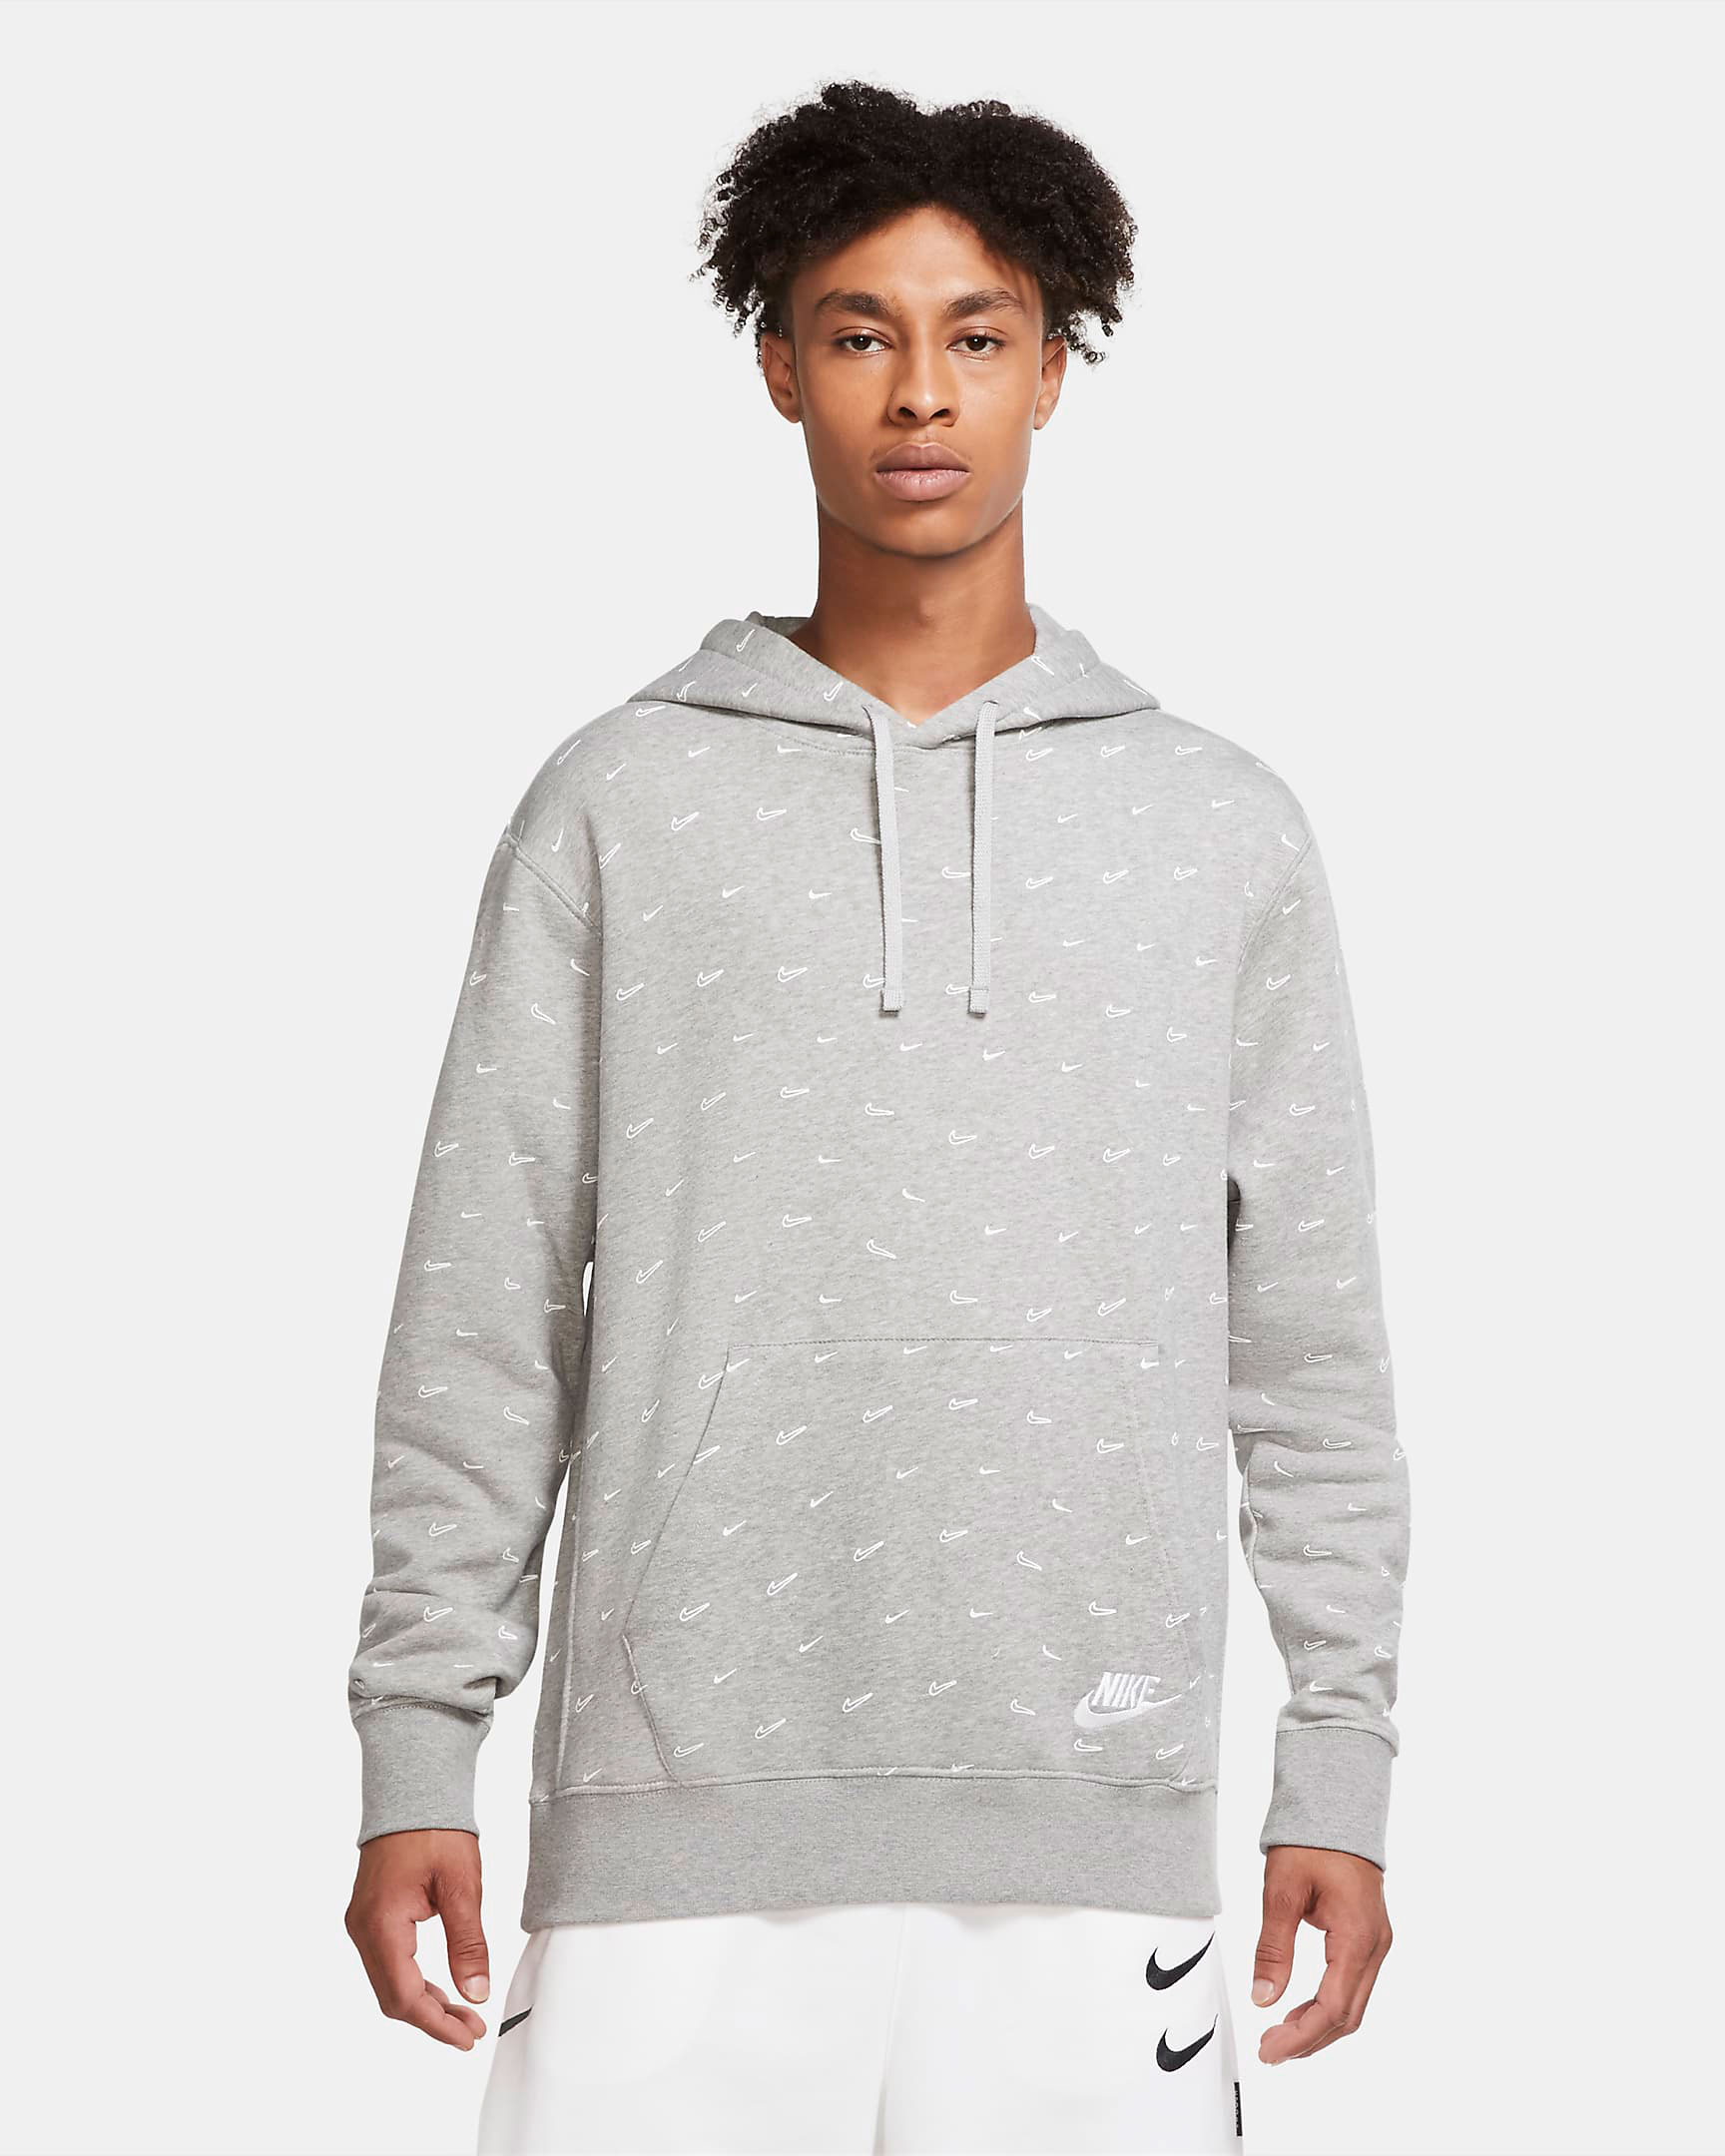 nike-adapt-bb-2-mag-grey-hoodie-match-1